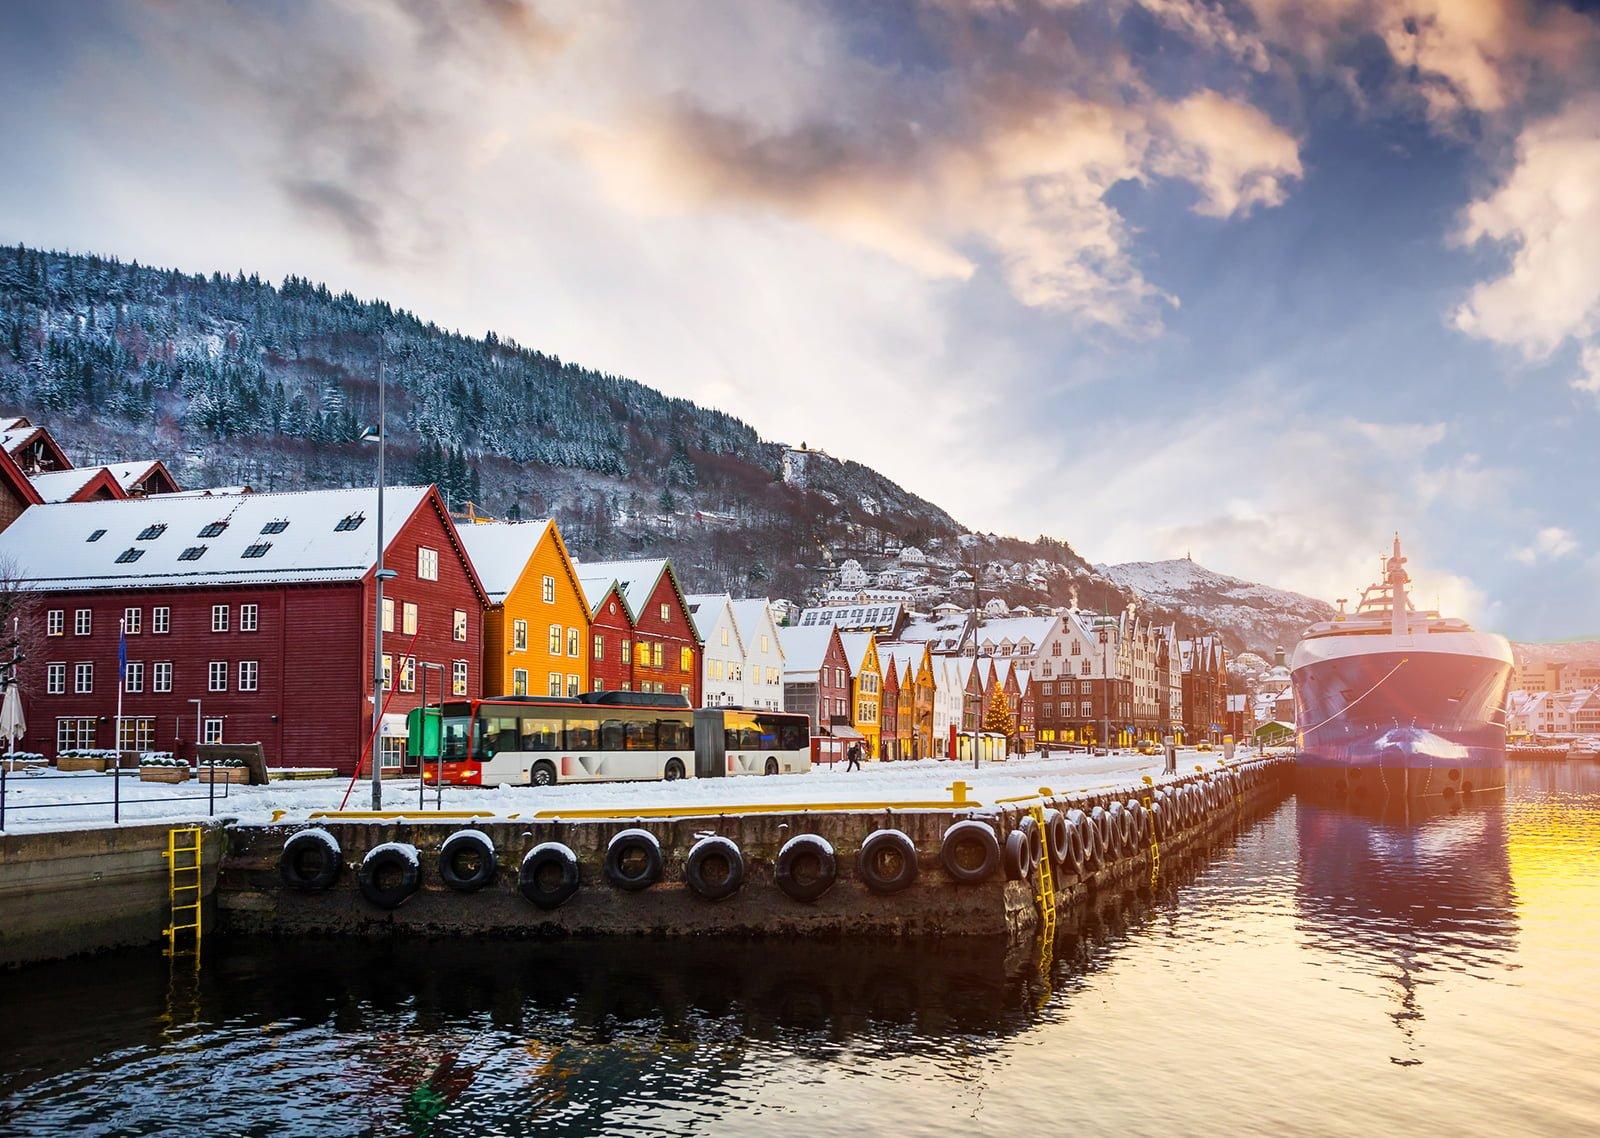 Bergen's Bryggen from the waterfront